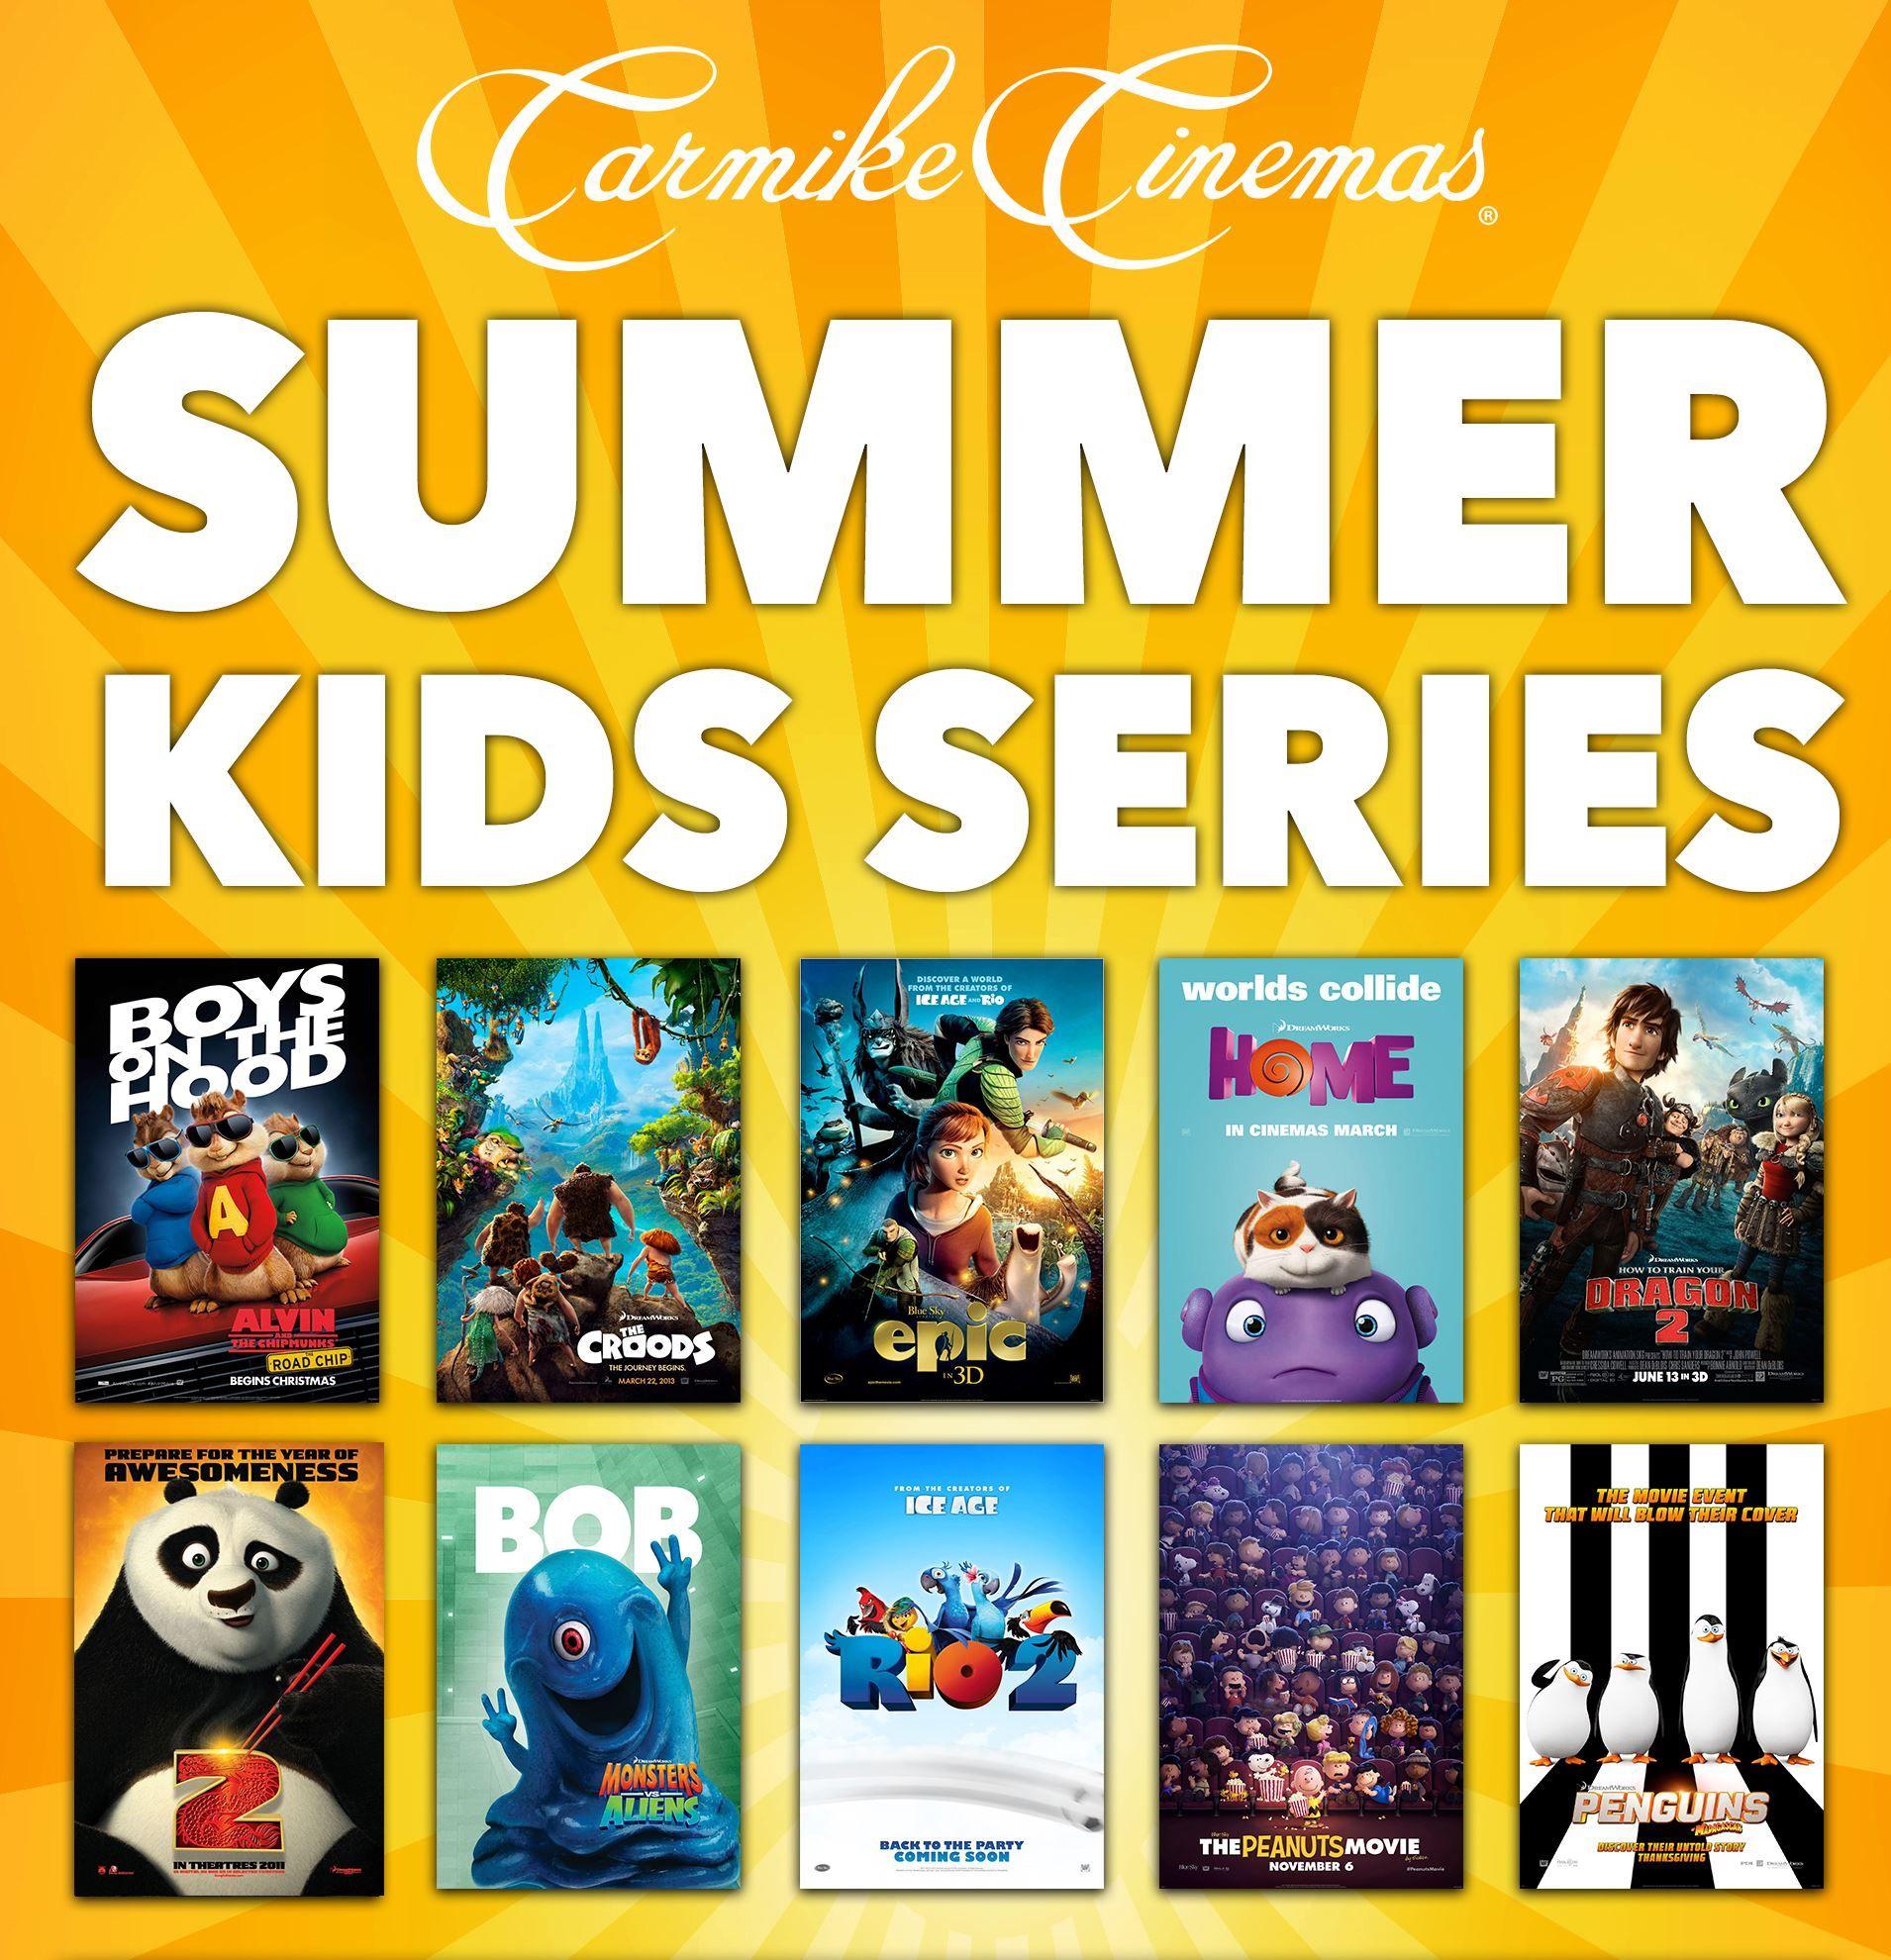 Summer kid series 2016 kids series summer kids kids